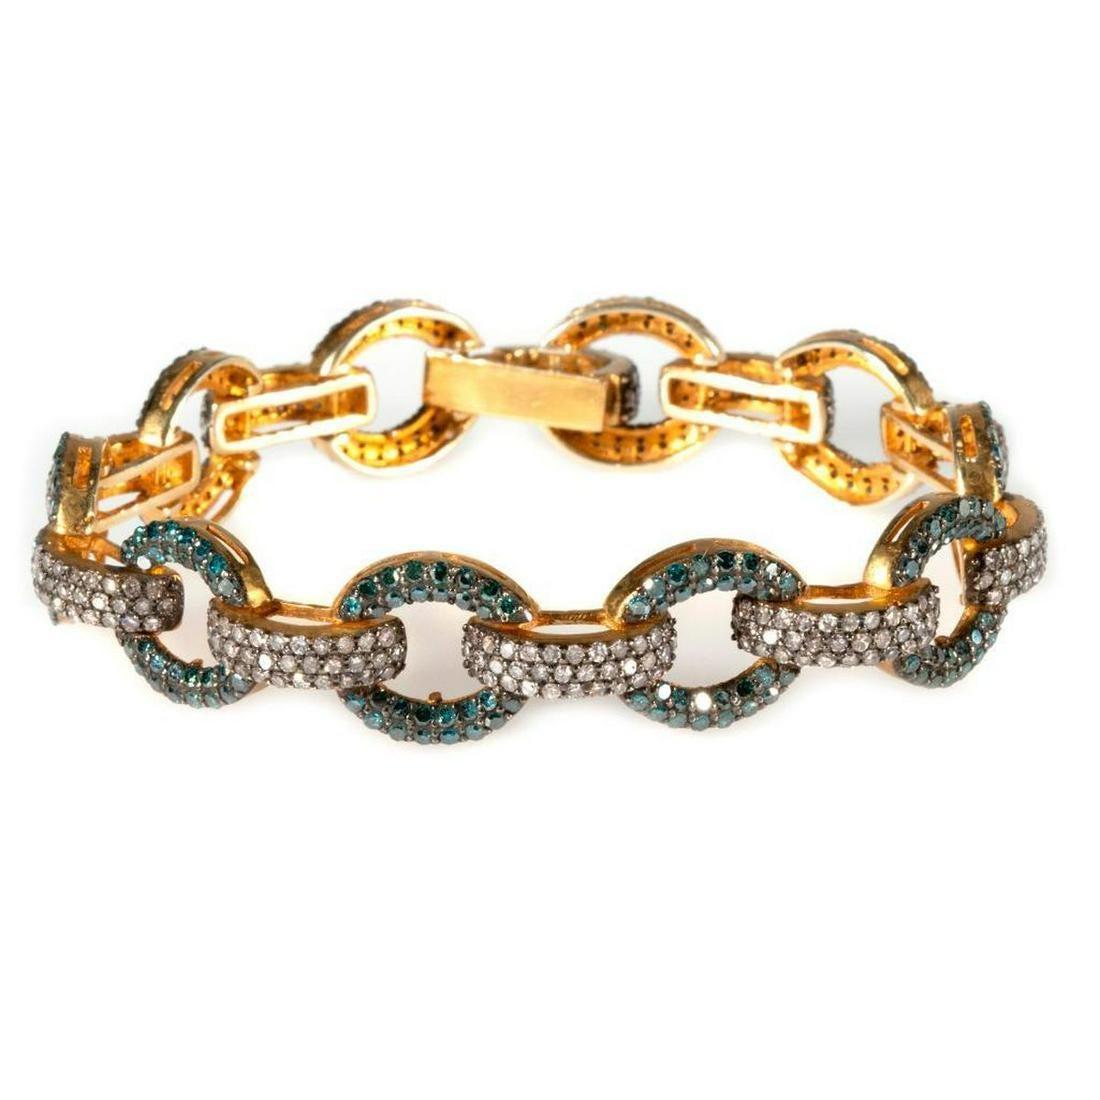 Diamond, colored diamond, vermeil silver link bracelet